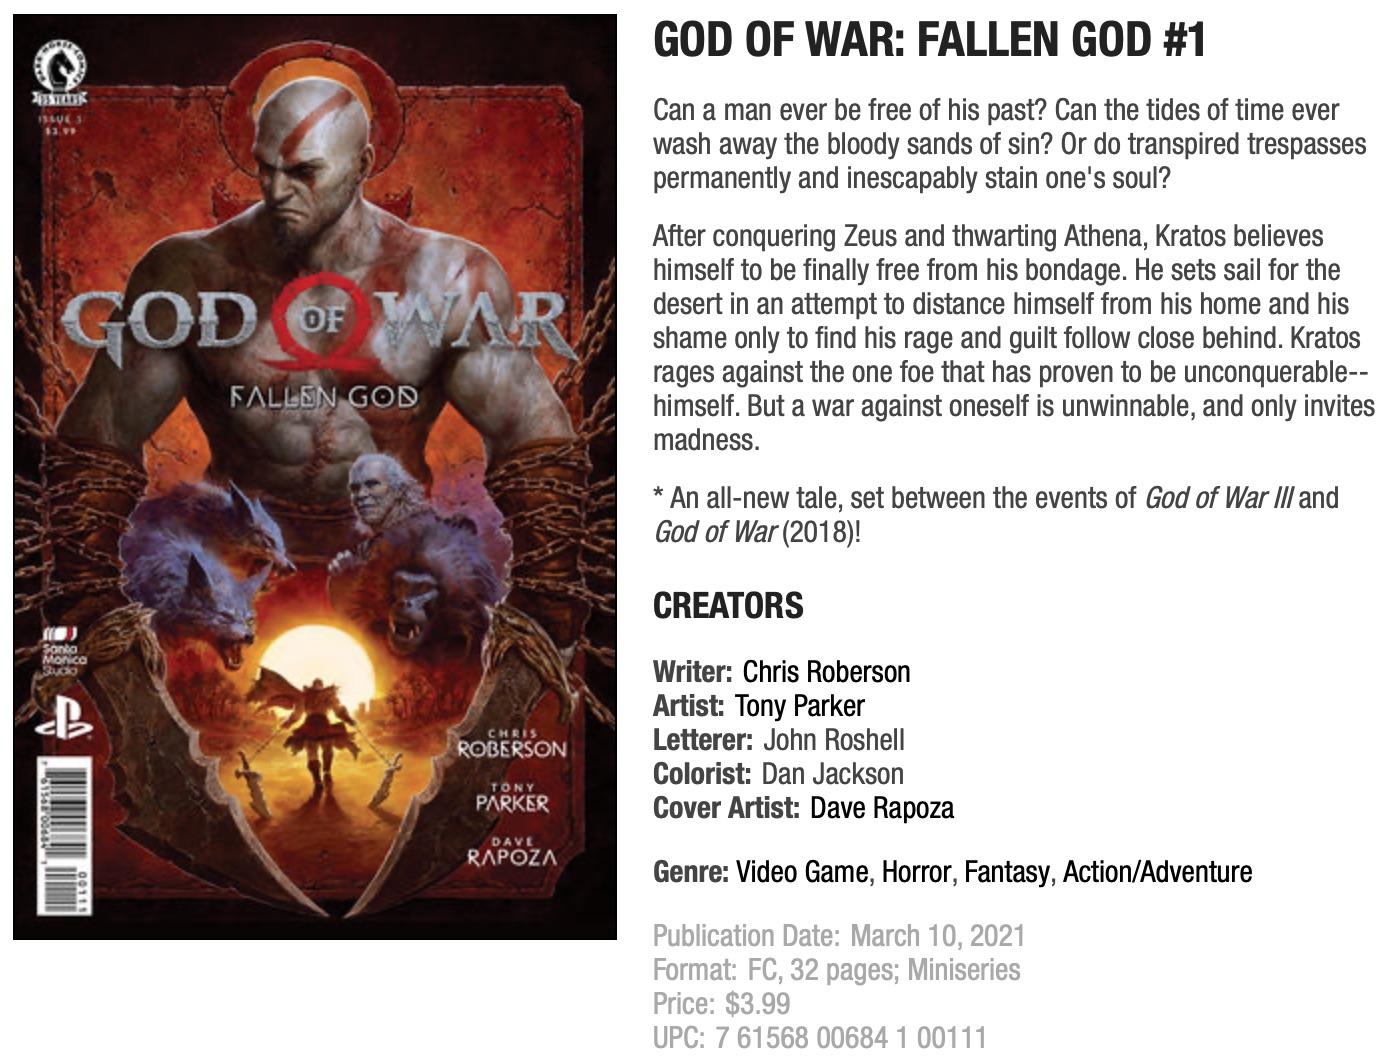 Раскрыта дата выхода God of War: Fallen God